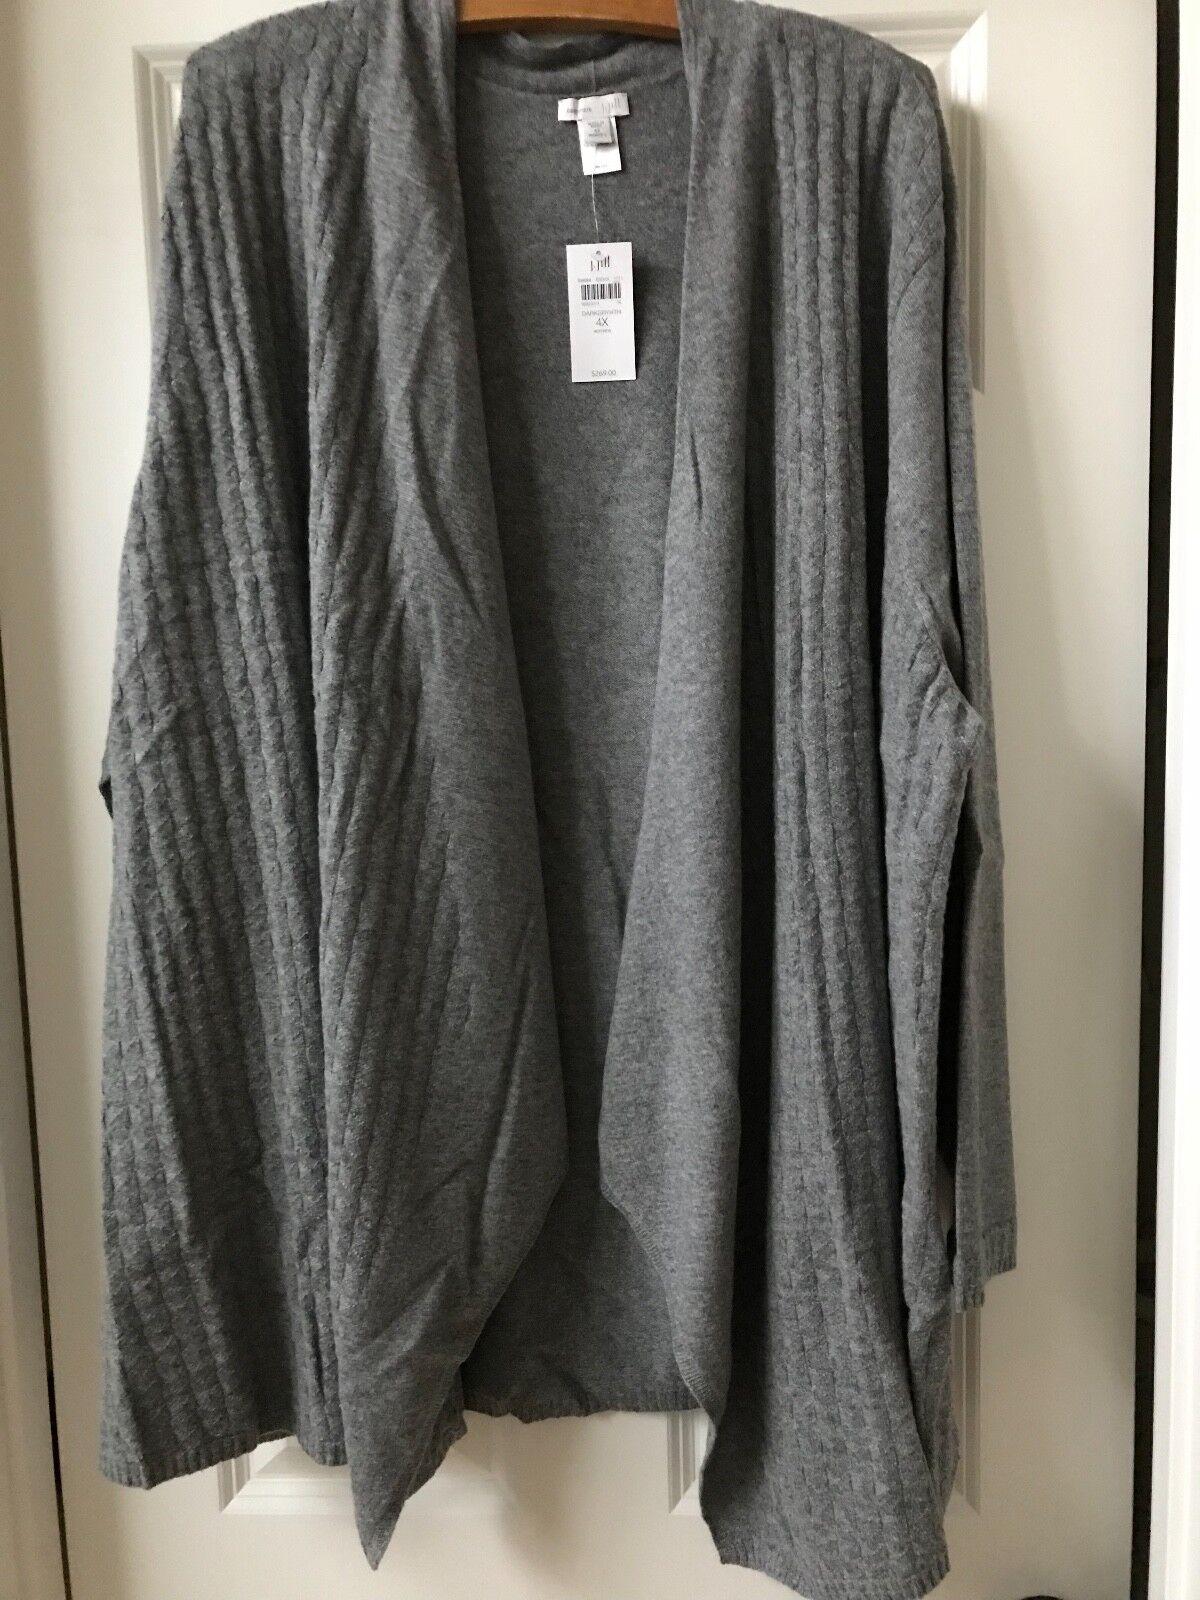 269 NWT J.Jill 100% Cashmere Drapped öppna Front Luxe bildigan tröja grå 4X